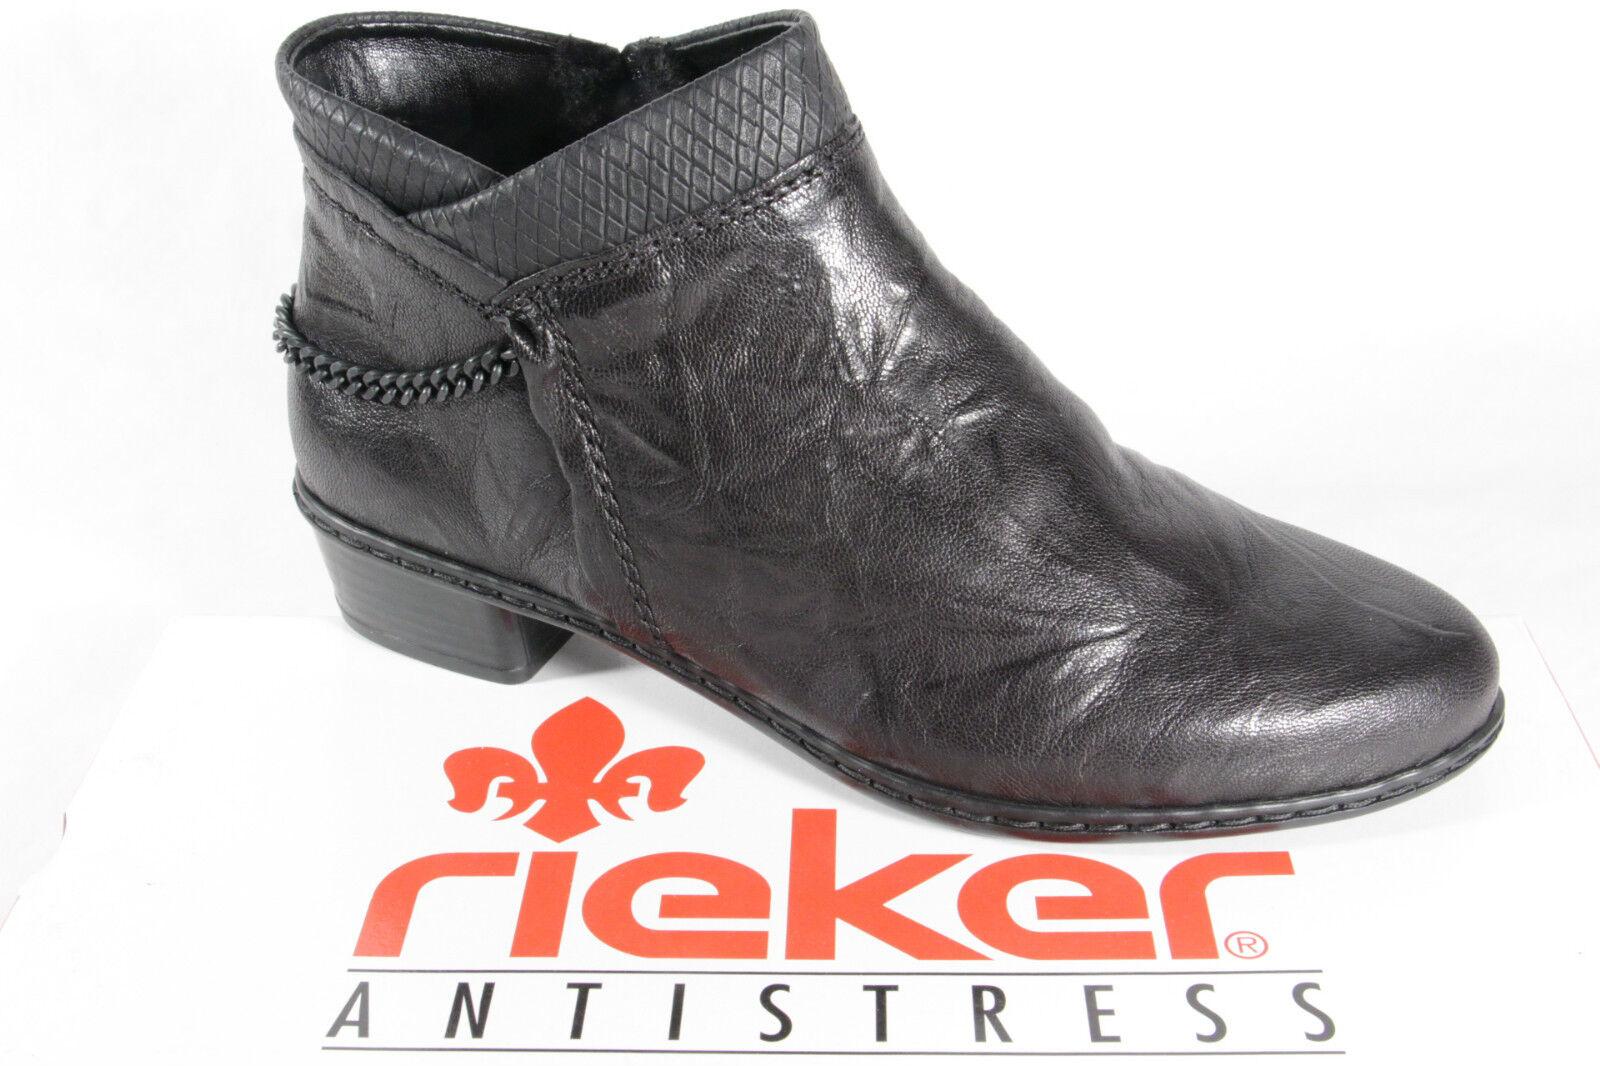 Rieker botas botines botas botas negro, de invierno negro, botas forradas nuevo e5825f